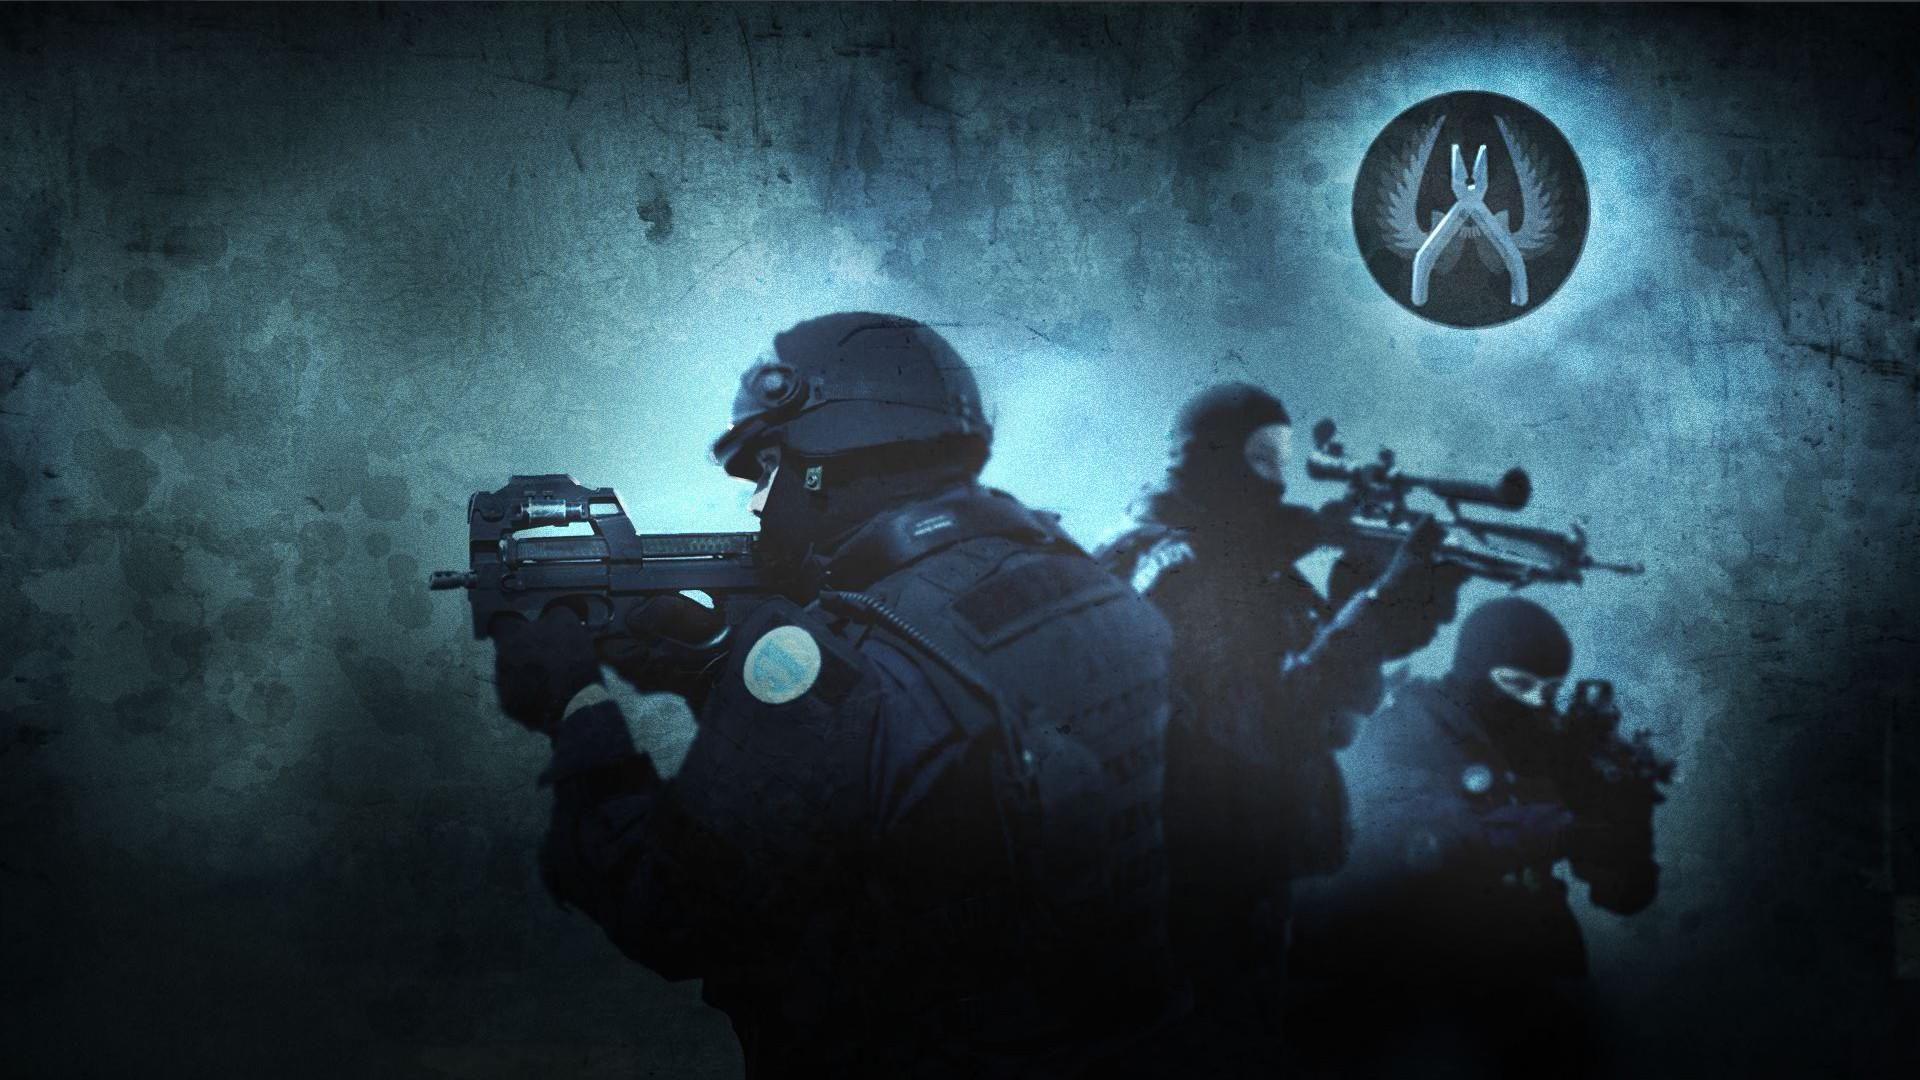 Counter Strike Global Offensive Black Logo Hd Wallpaper Wallpapers Gg Dota 2 Hile Oyun